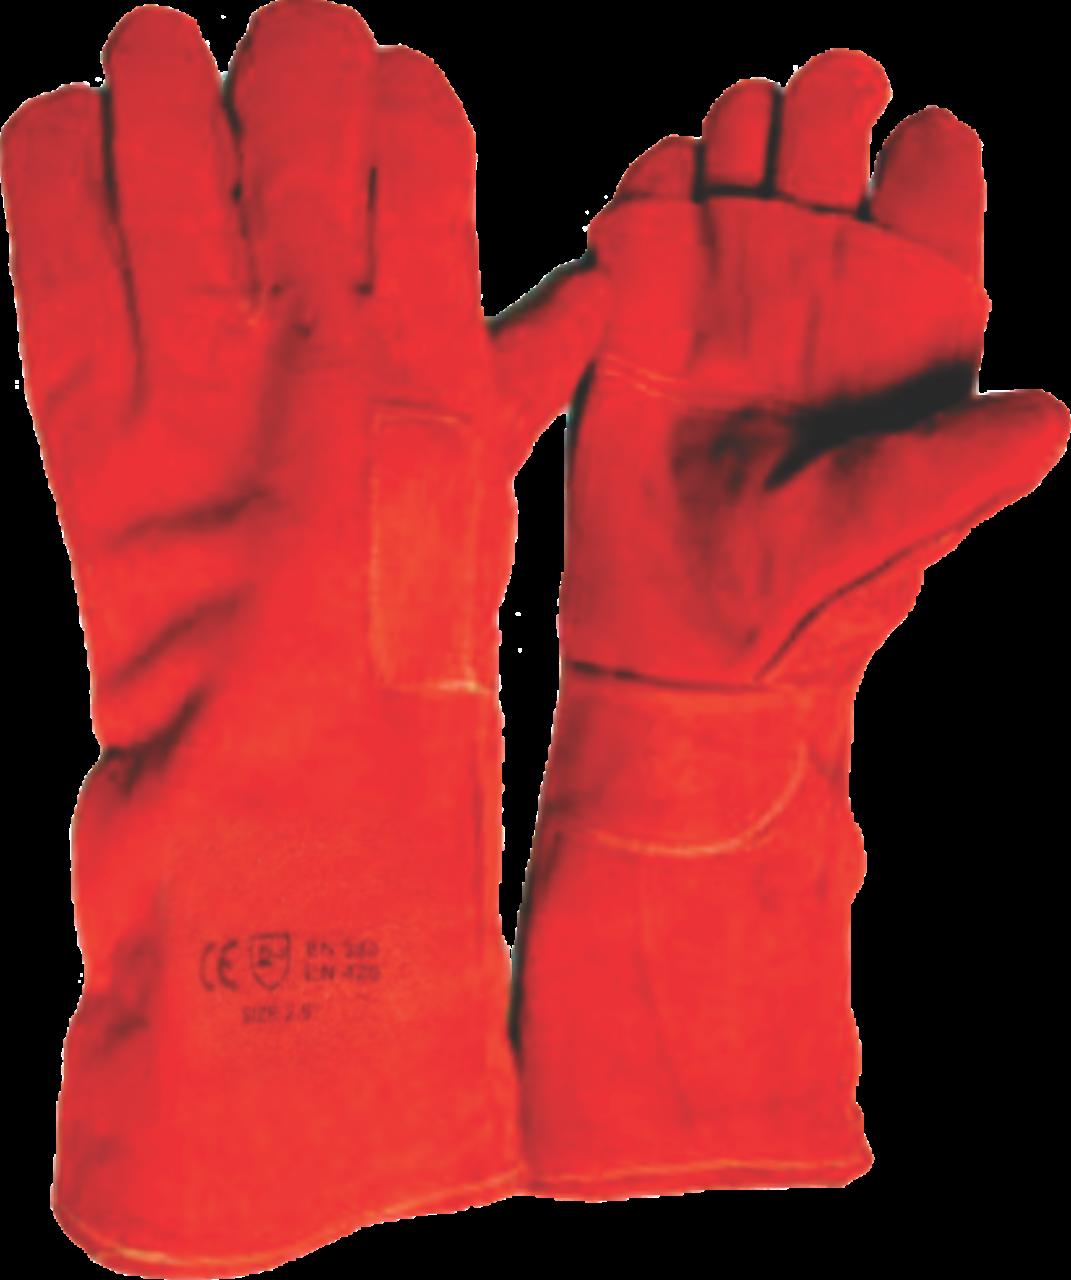 PREMIUM RED HEAT - KEVLAR LINED GLOVE